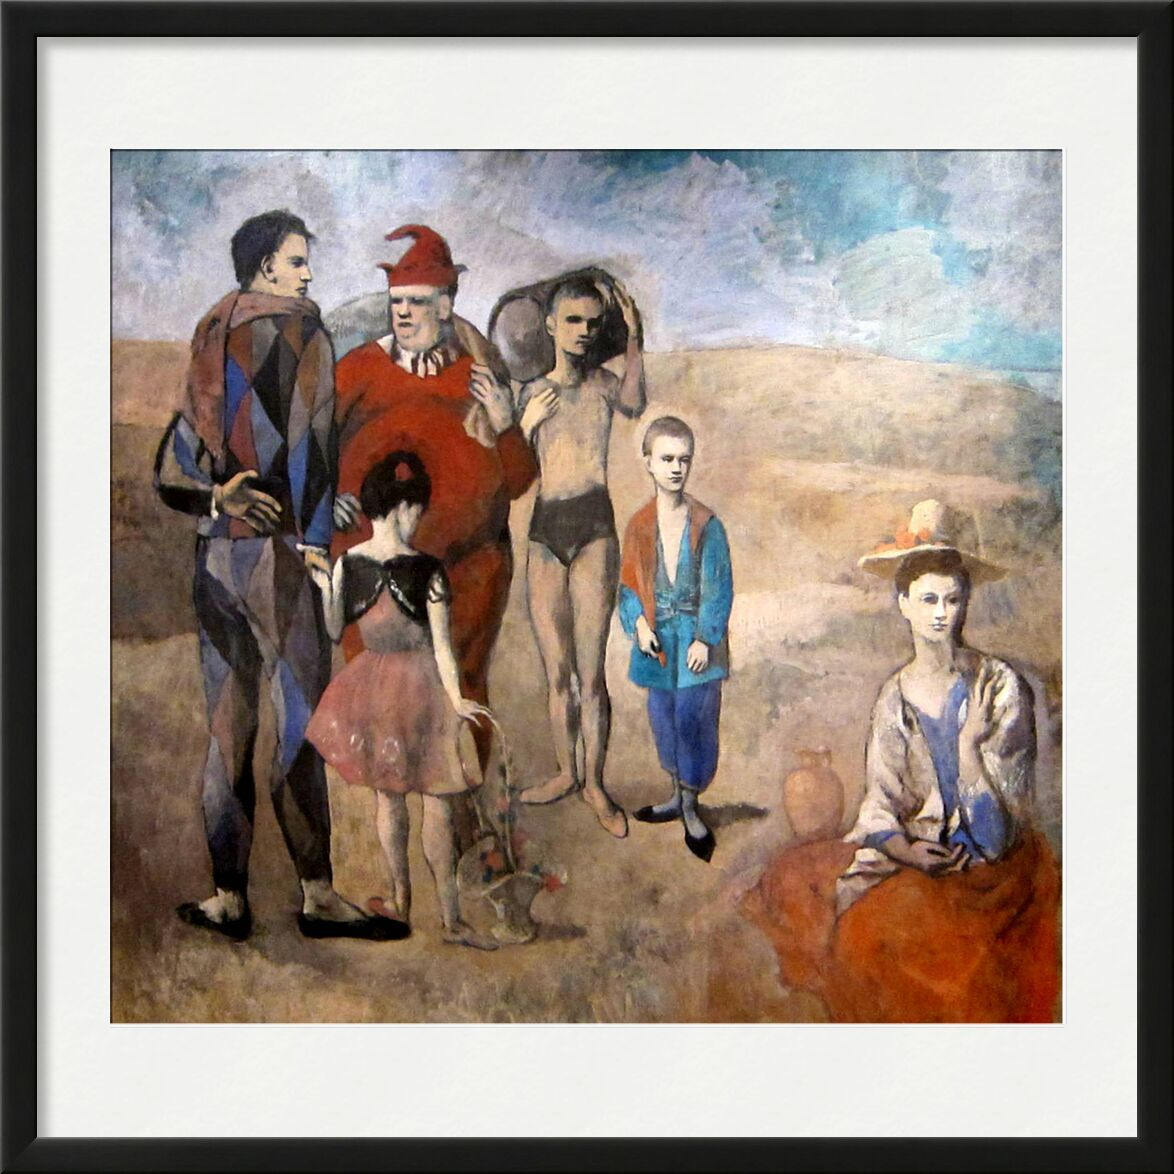 Family of Saltimbanques desde AUX BEAUX-ARTS, Prodi Art, picasso, pintura, familia, playa, verano, arena, acróbatas